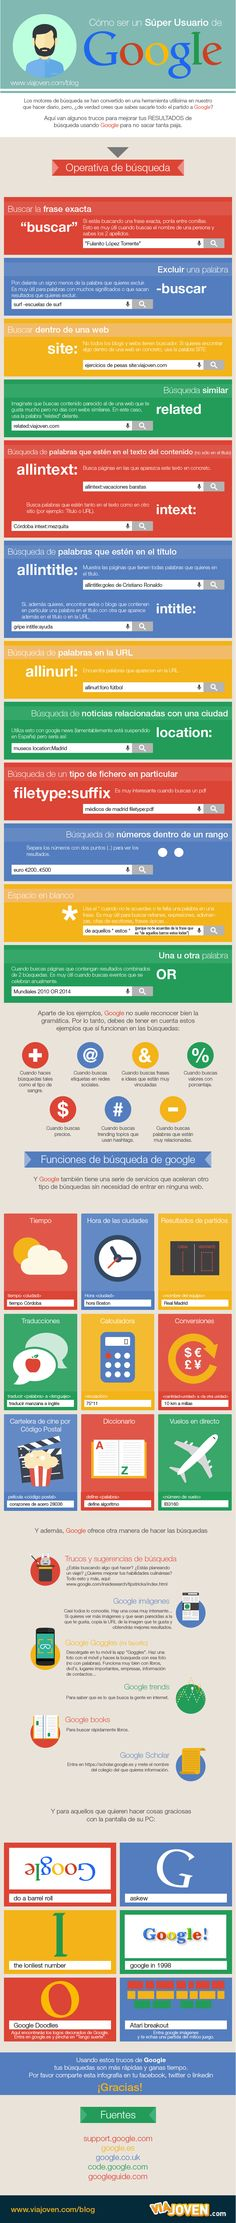 Infografía de trucos de búsqueda con google